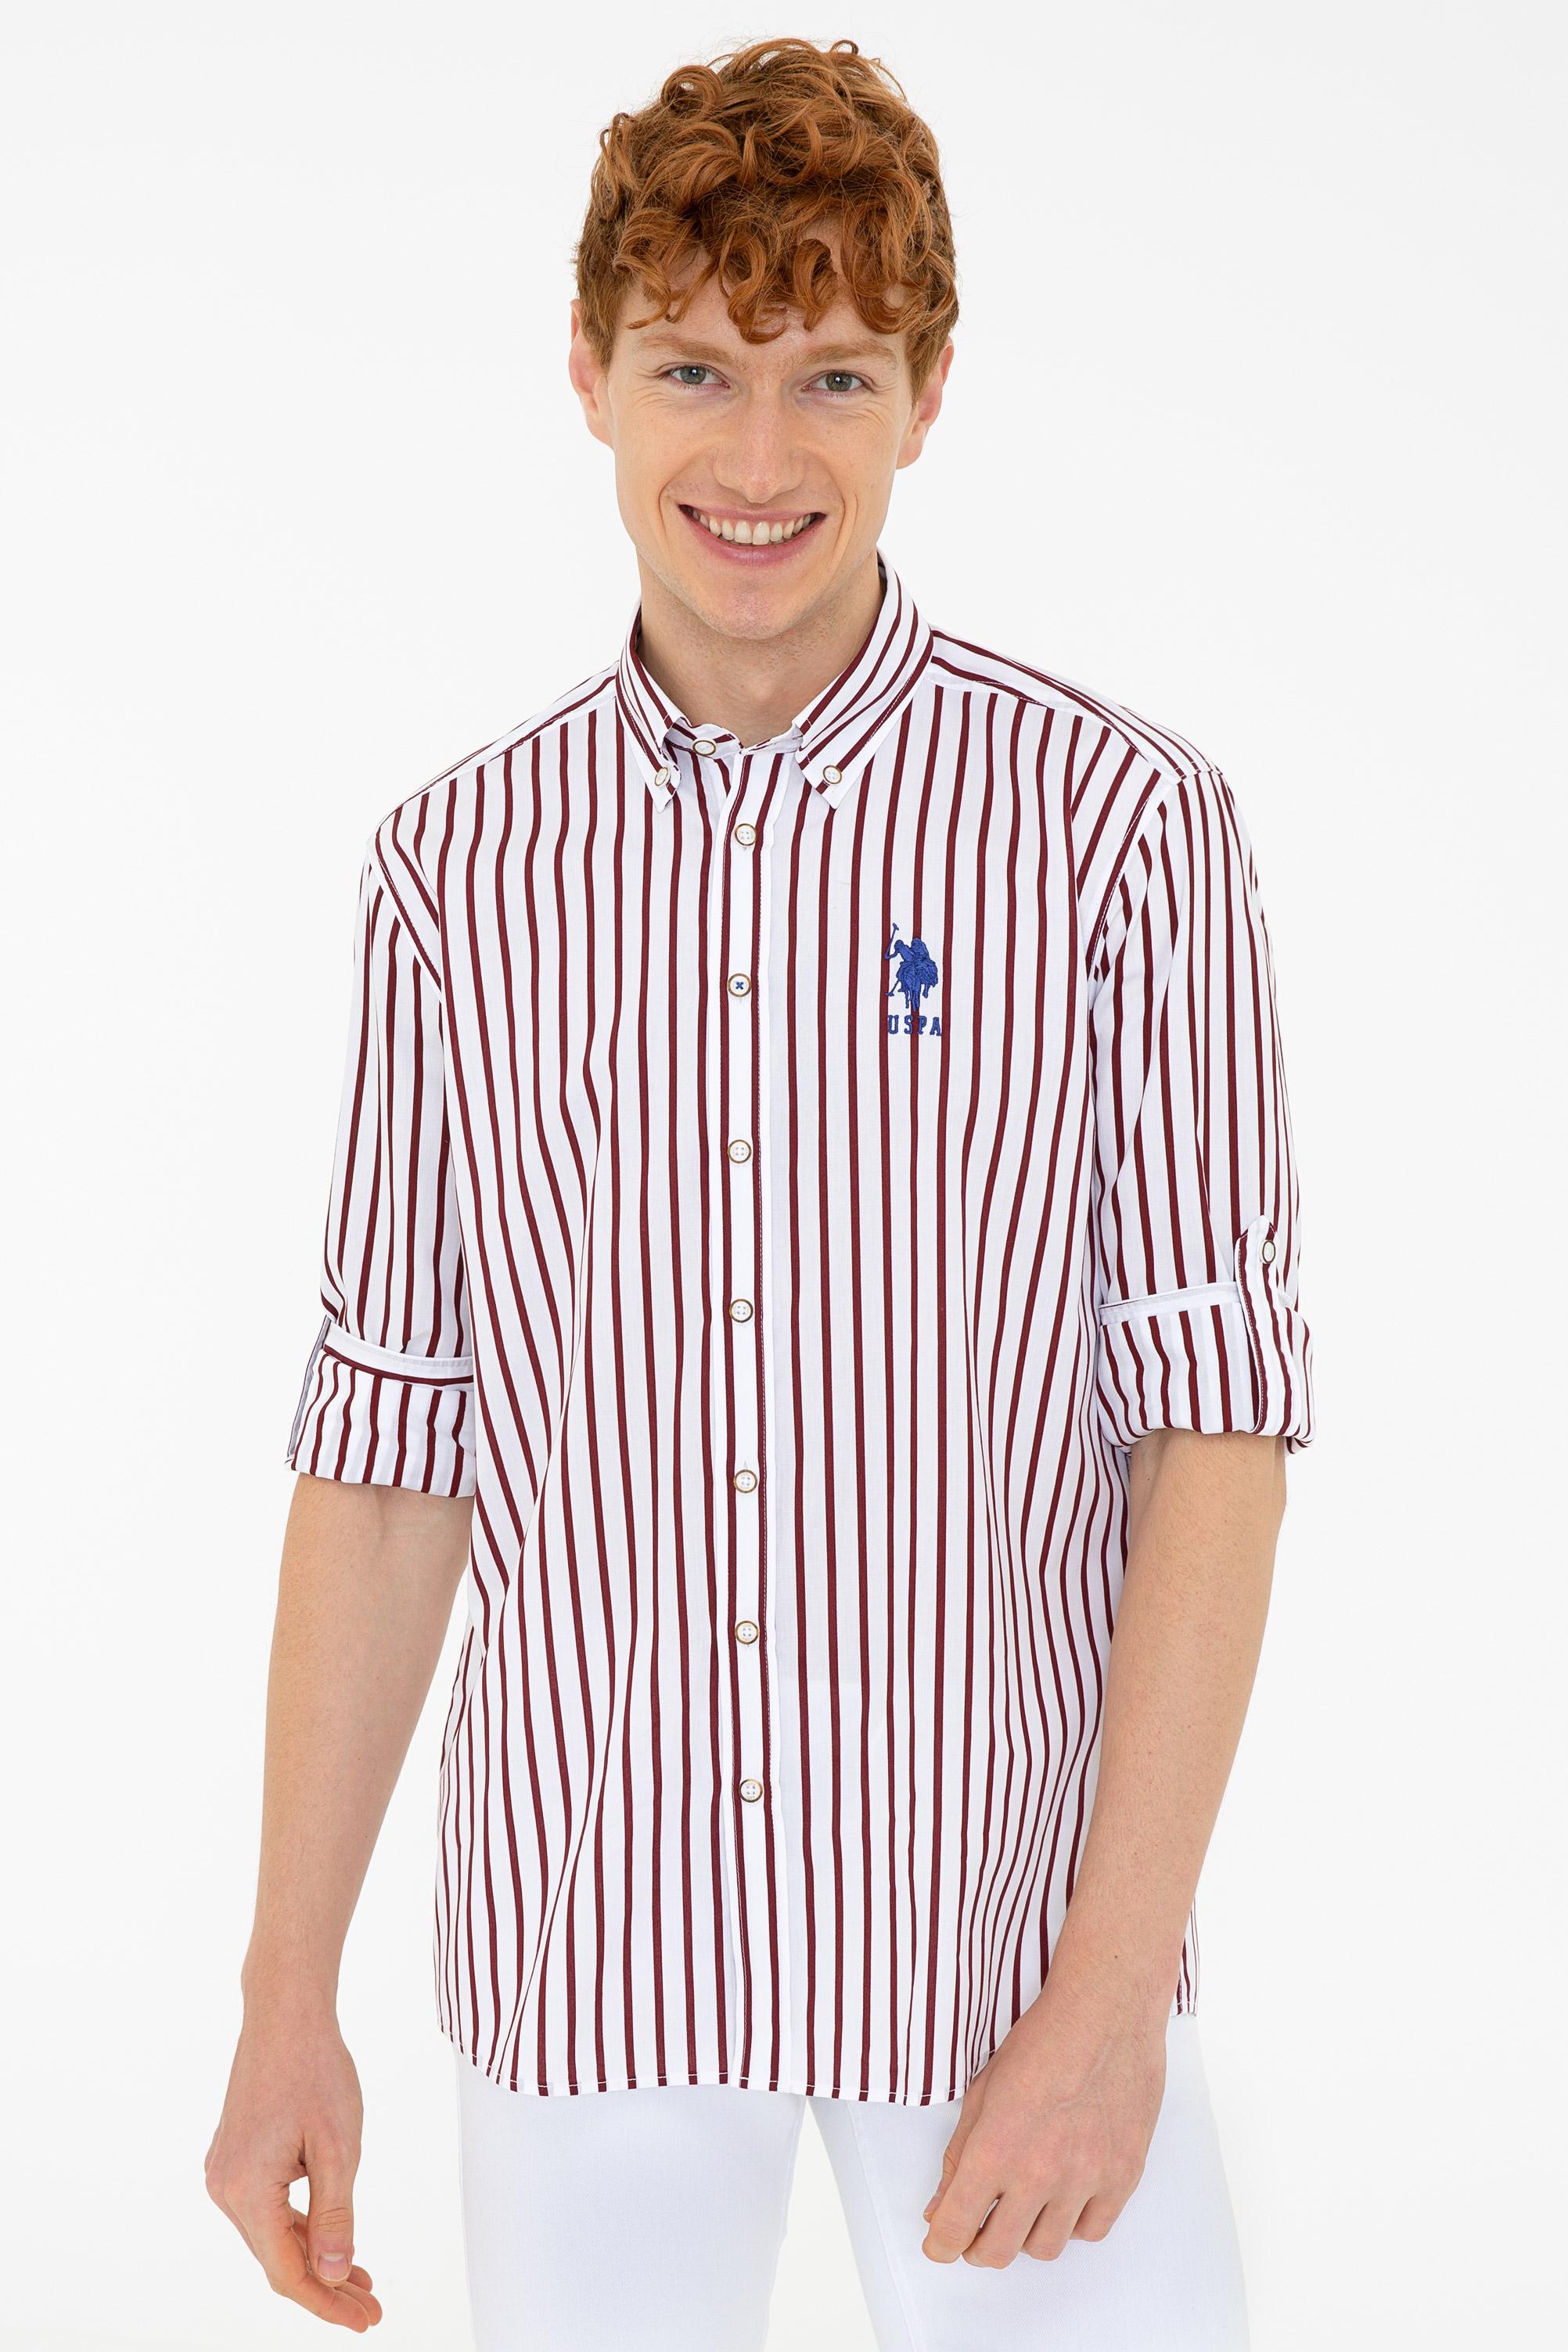 Рубашка мужская U.S. POLO Assn. G081SZ0040R-ALP белая L